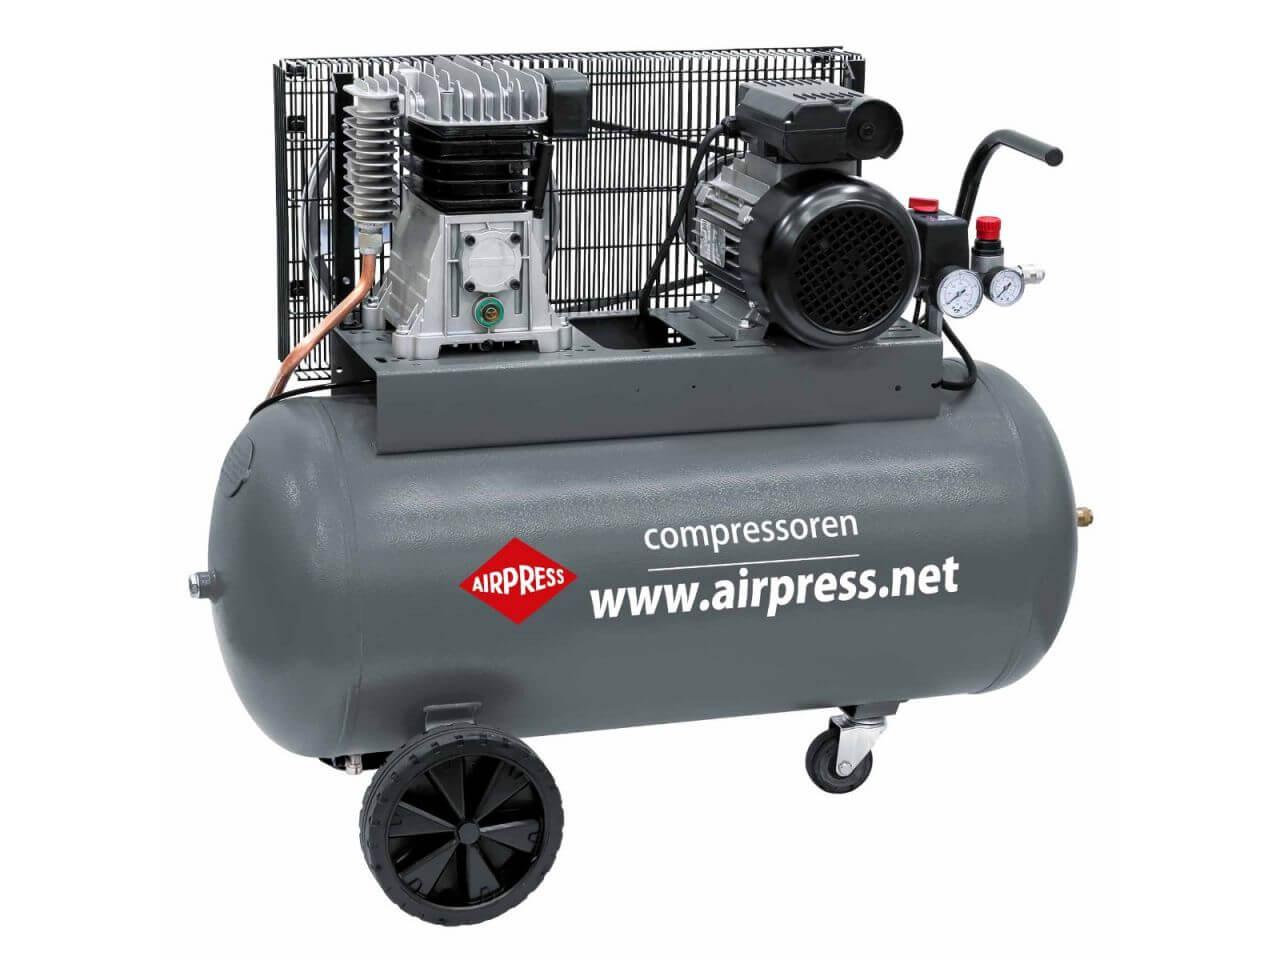 Professioneller Kompressor HK 375-100 Airpress